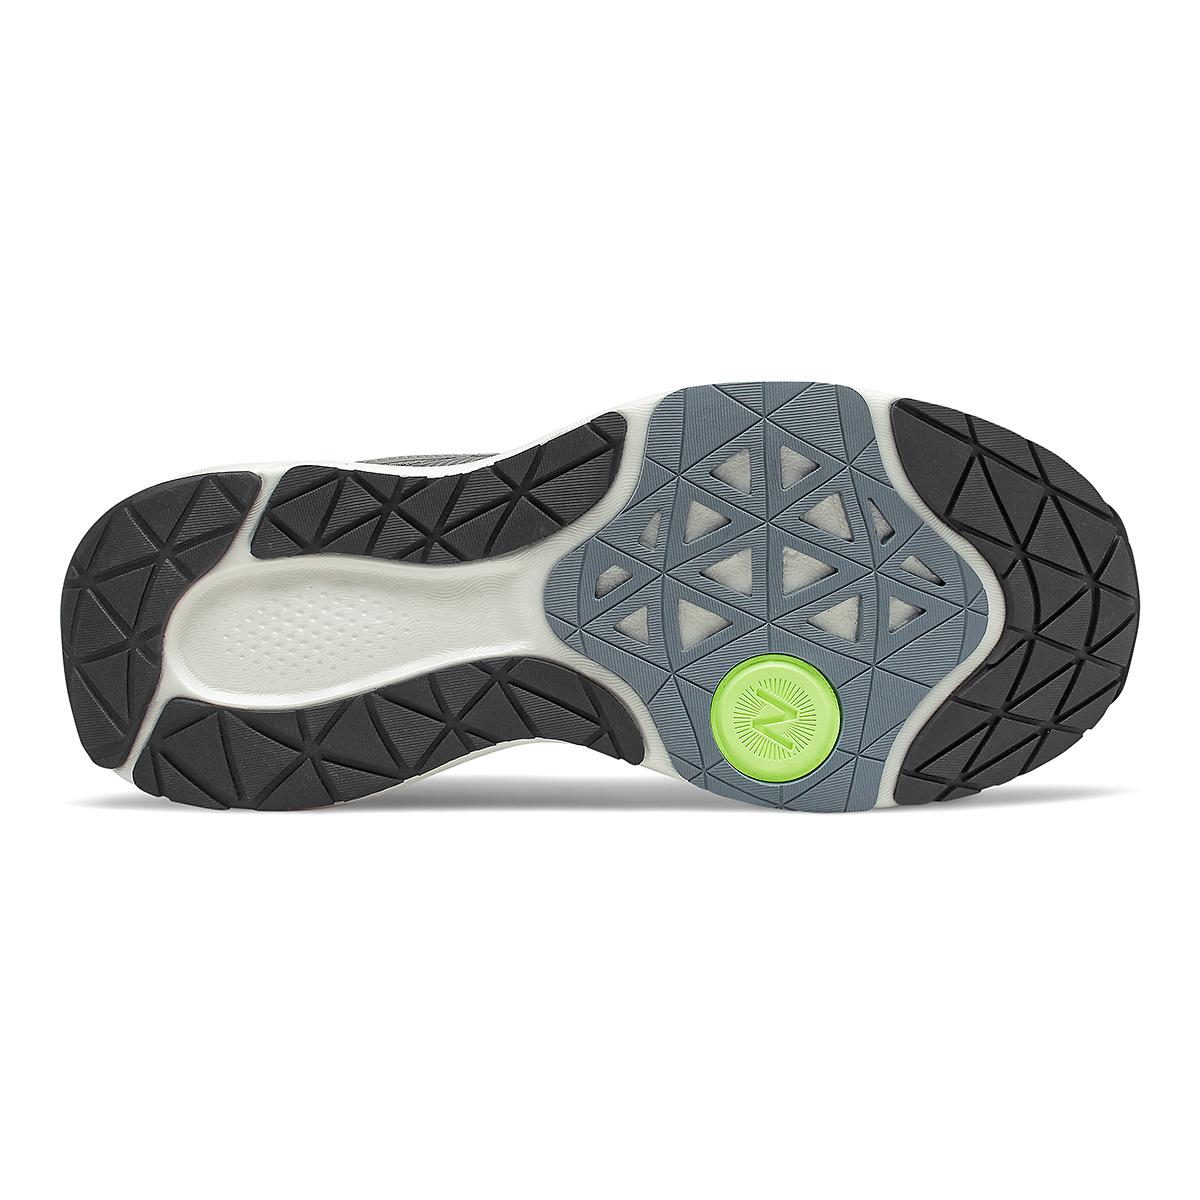 Men's New Balance Lerato Running Shoe, , large, image 4